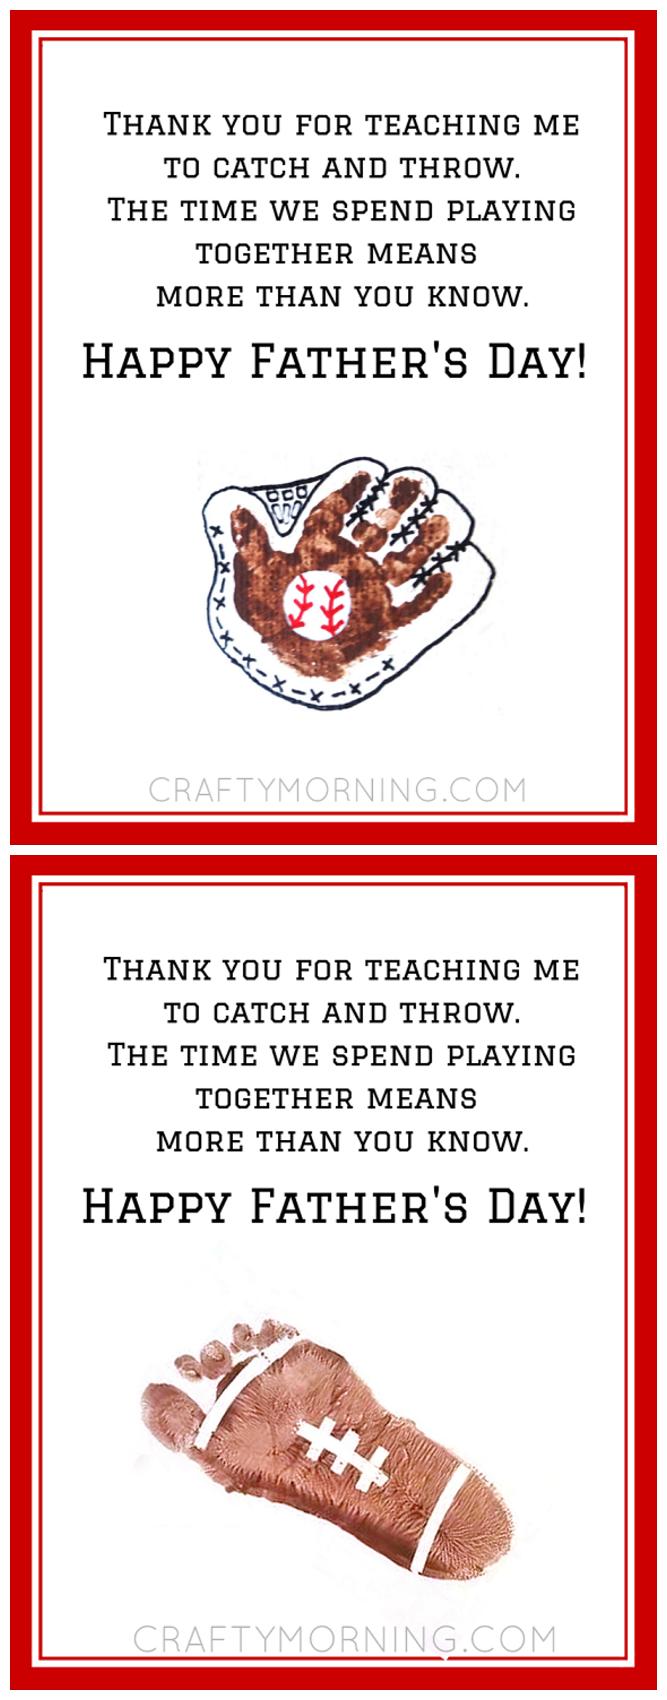 Free Baseball/football Father's Day Poem Printable - Great Gift - Free Printable Fathers Day Poems For Preschoolers